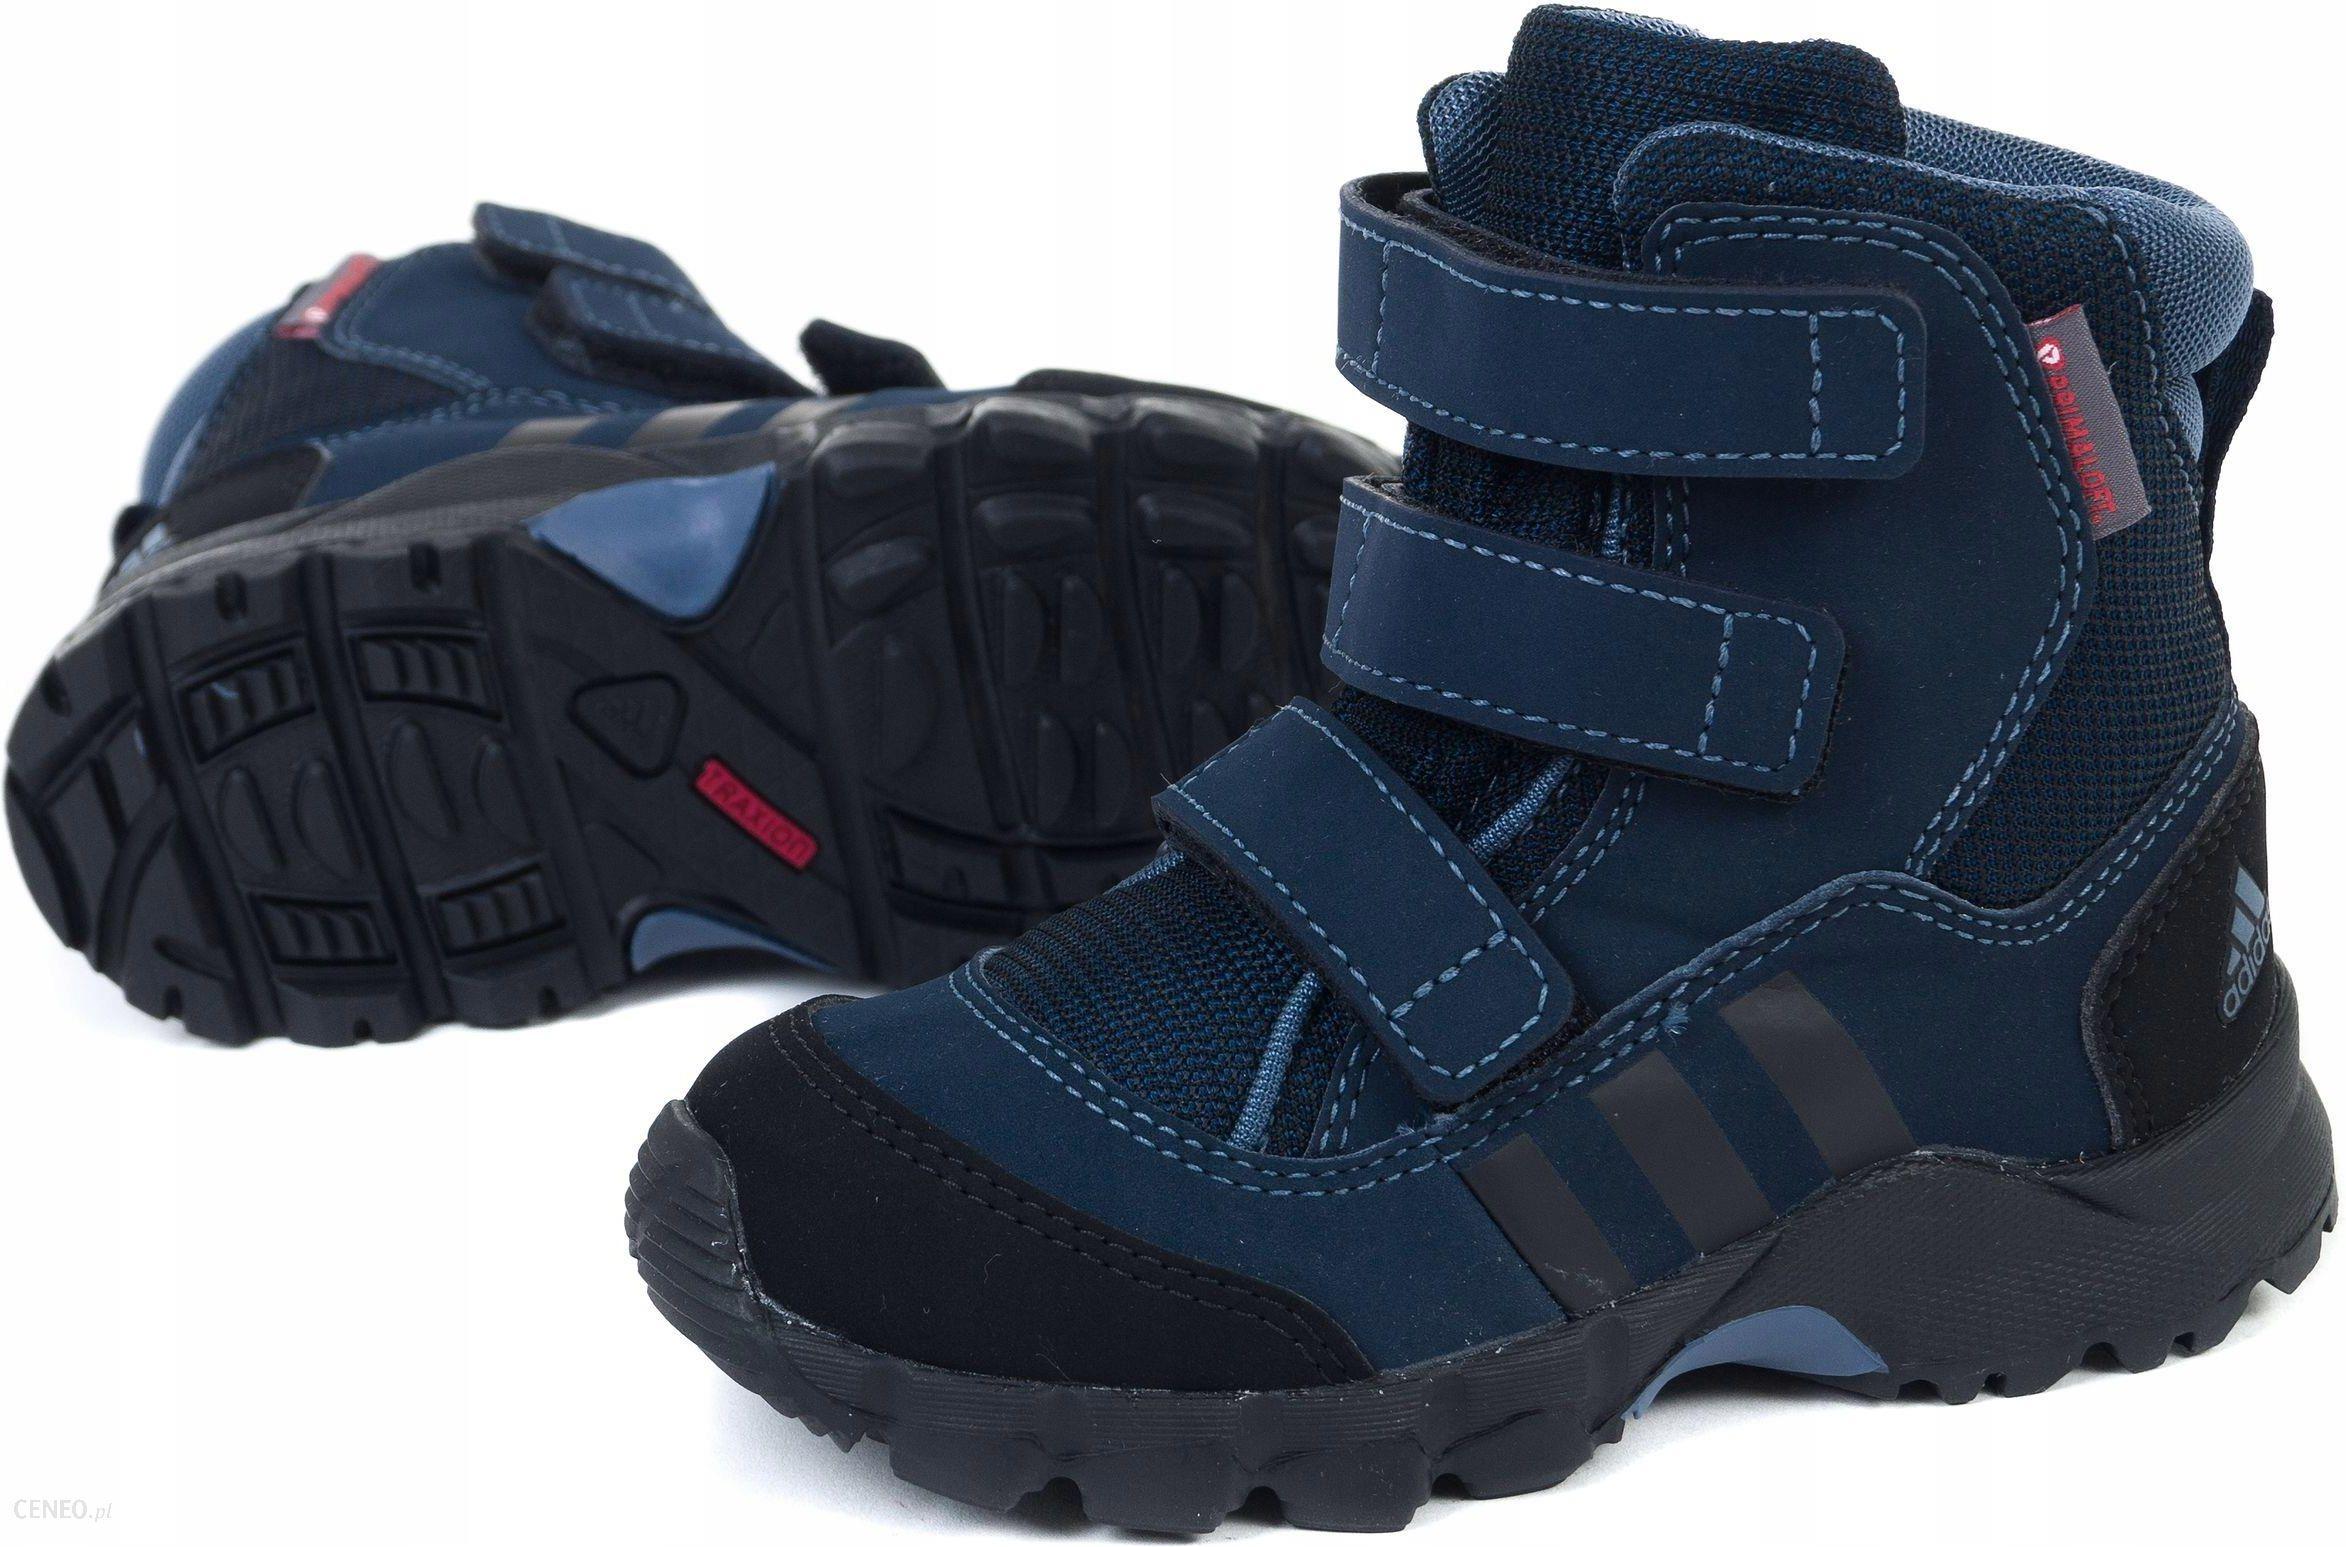 Buty Adidas Cw Holtanna Snow Cf I EF2960 R. 25 Ceny i opinie Ceneo.pl